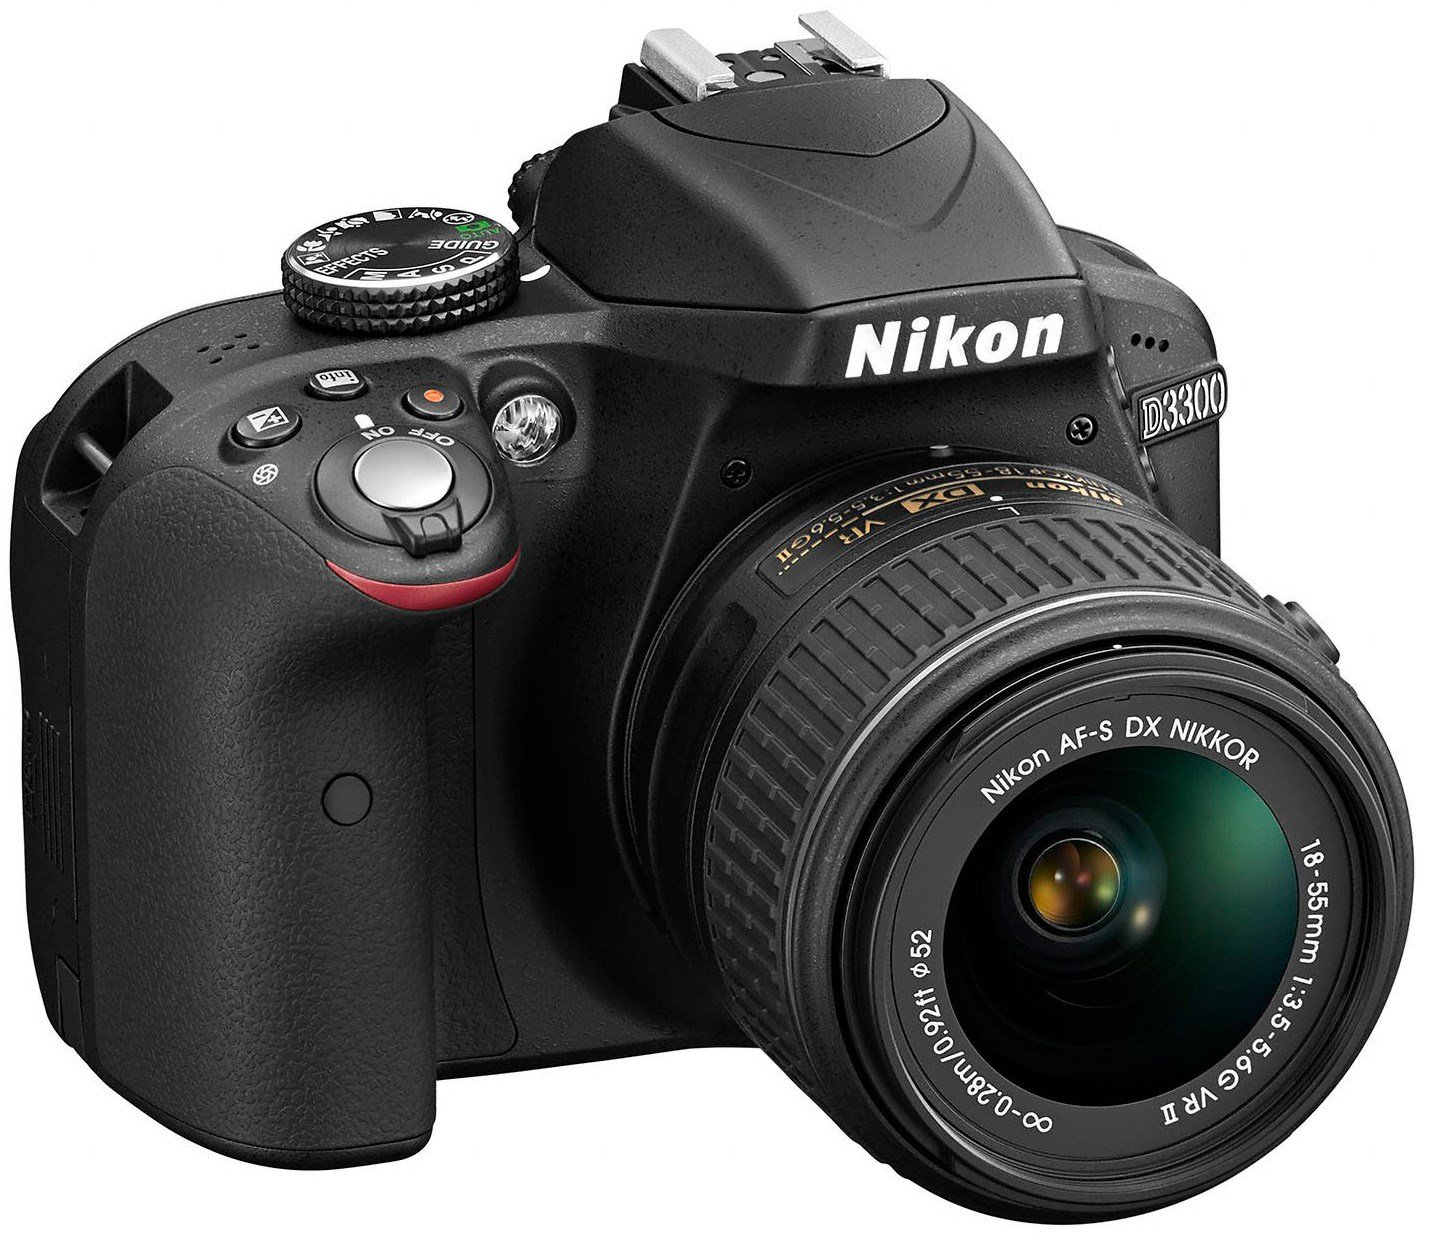 Camera Cheap Dslr Cameras Uk nikon d3300 digital slr camera black amazon co uk photo